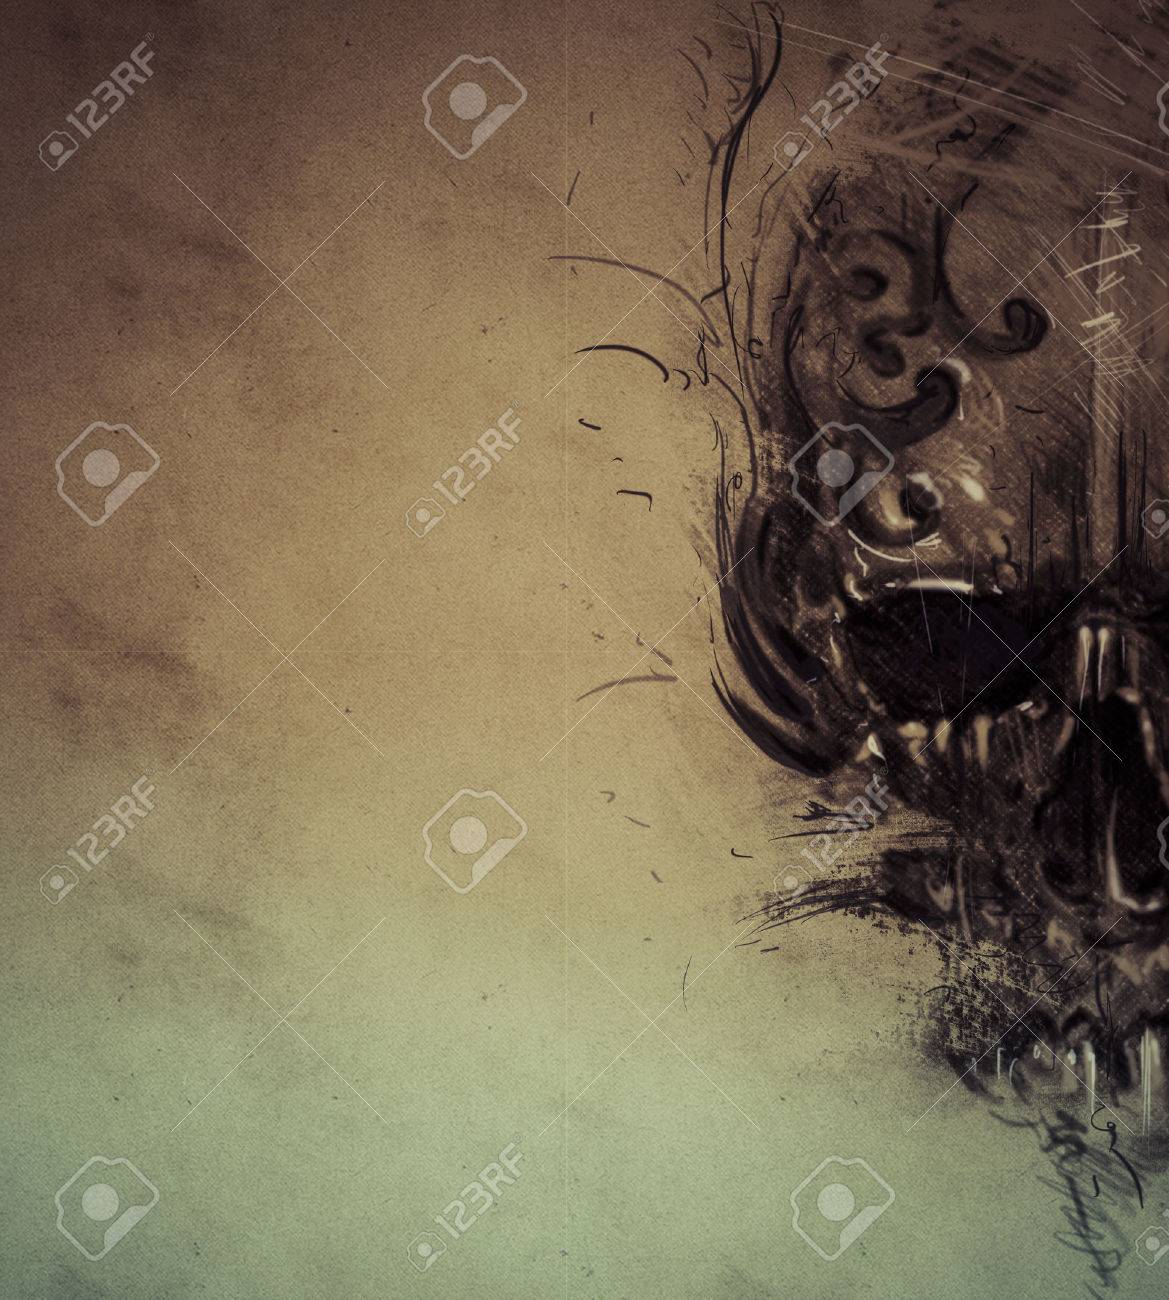 Tattoo skull over vintage paper, design handmade - 32340770